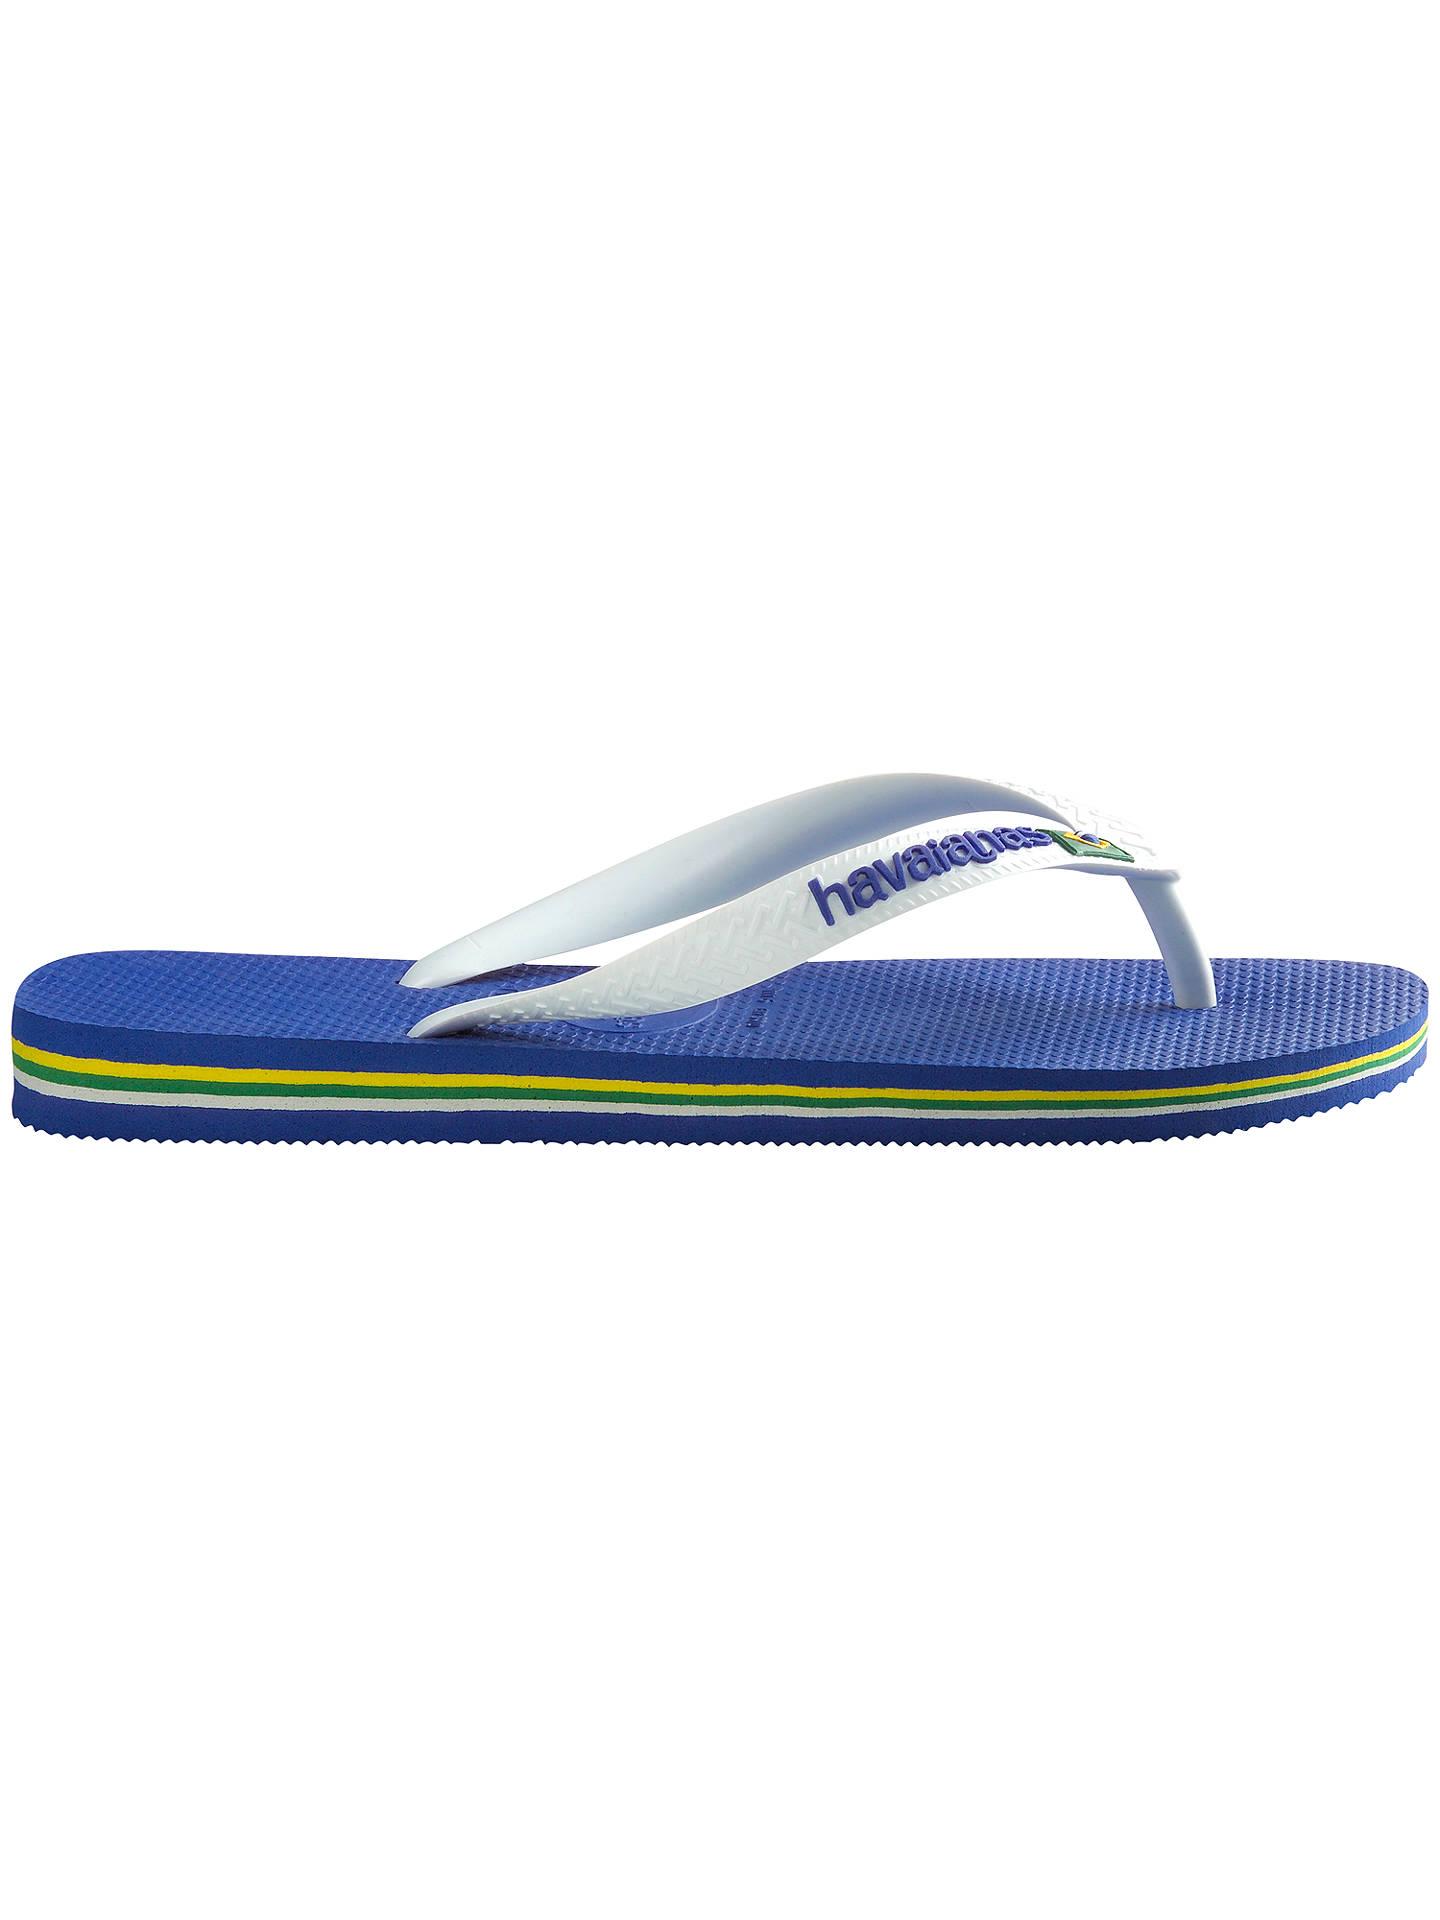 7514f957b8d3d Buy Havaianas Brasil Logo Flip Flops